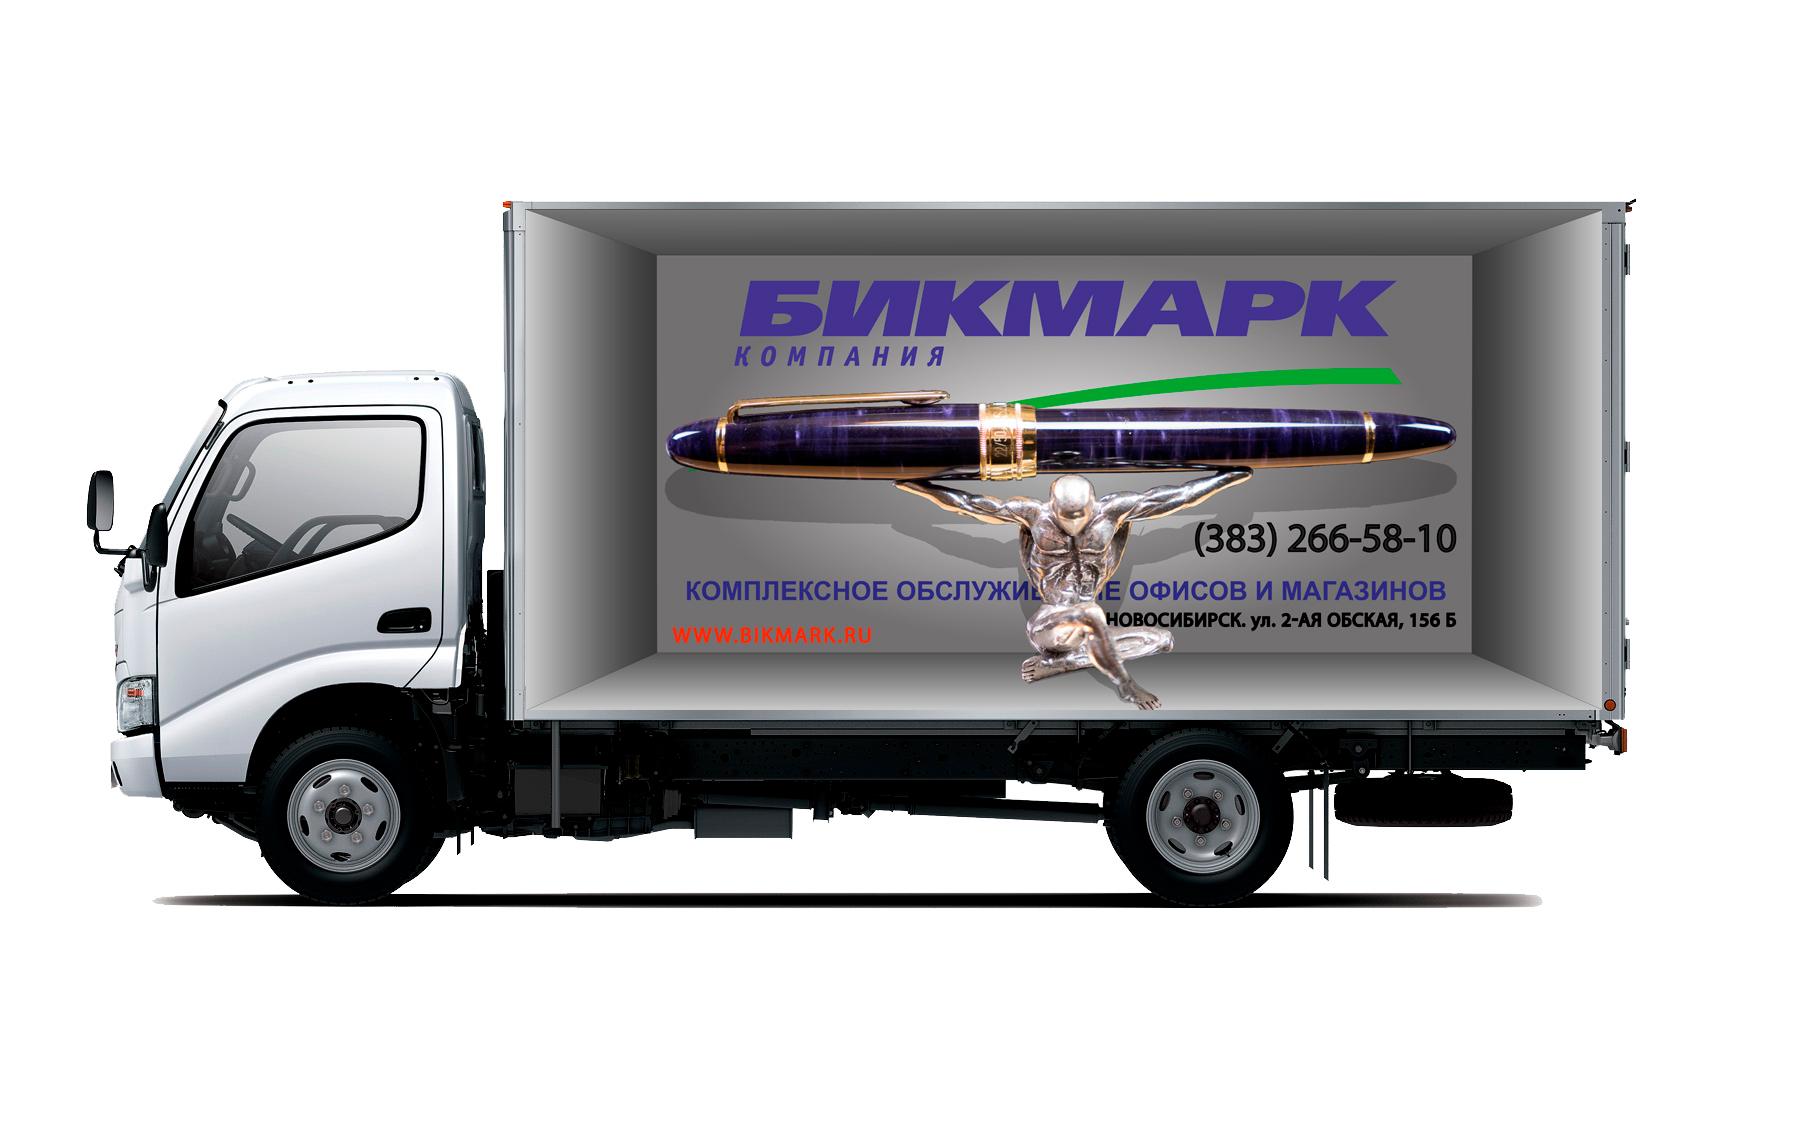 Разработка  рекламы на грузовые машины фото f_0245b2eb2ee83747.jpg